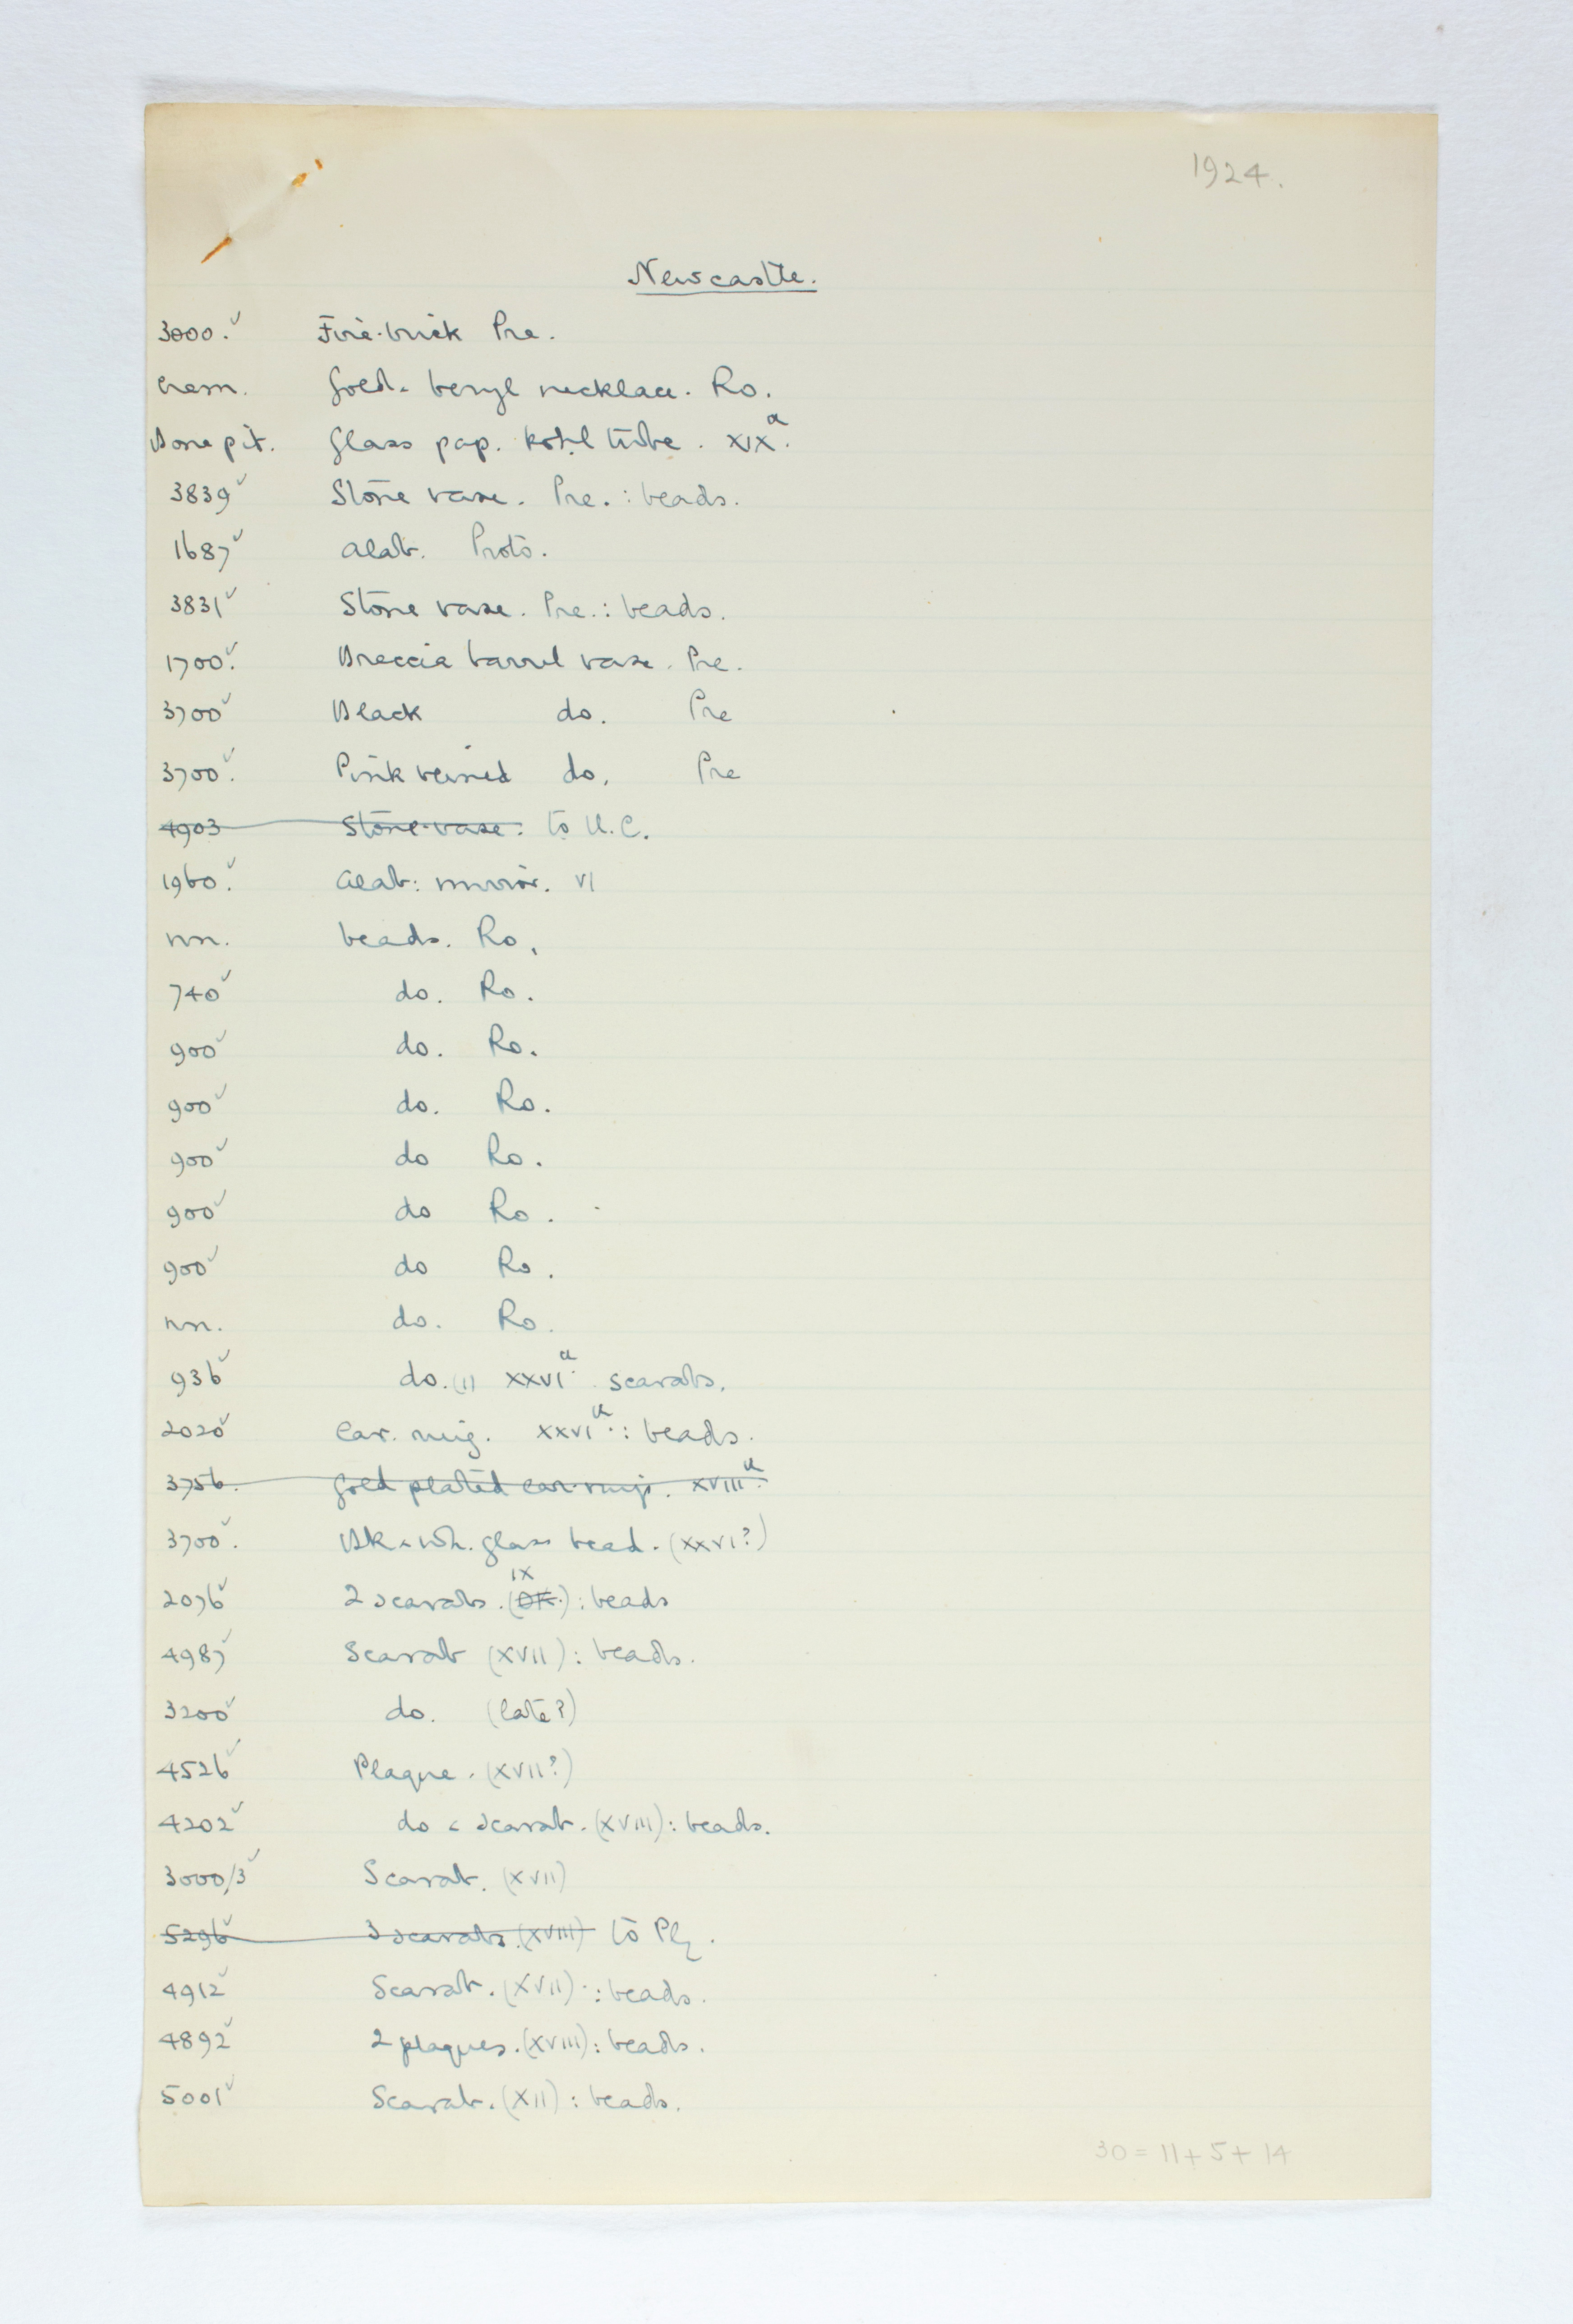 1923-24 Qau el-Kebir, Hemamieh Individual institution list PMA/WFP1/D/27/20.1